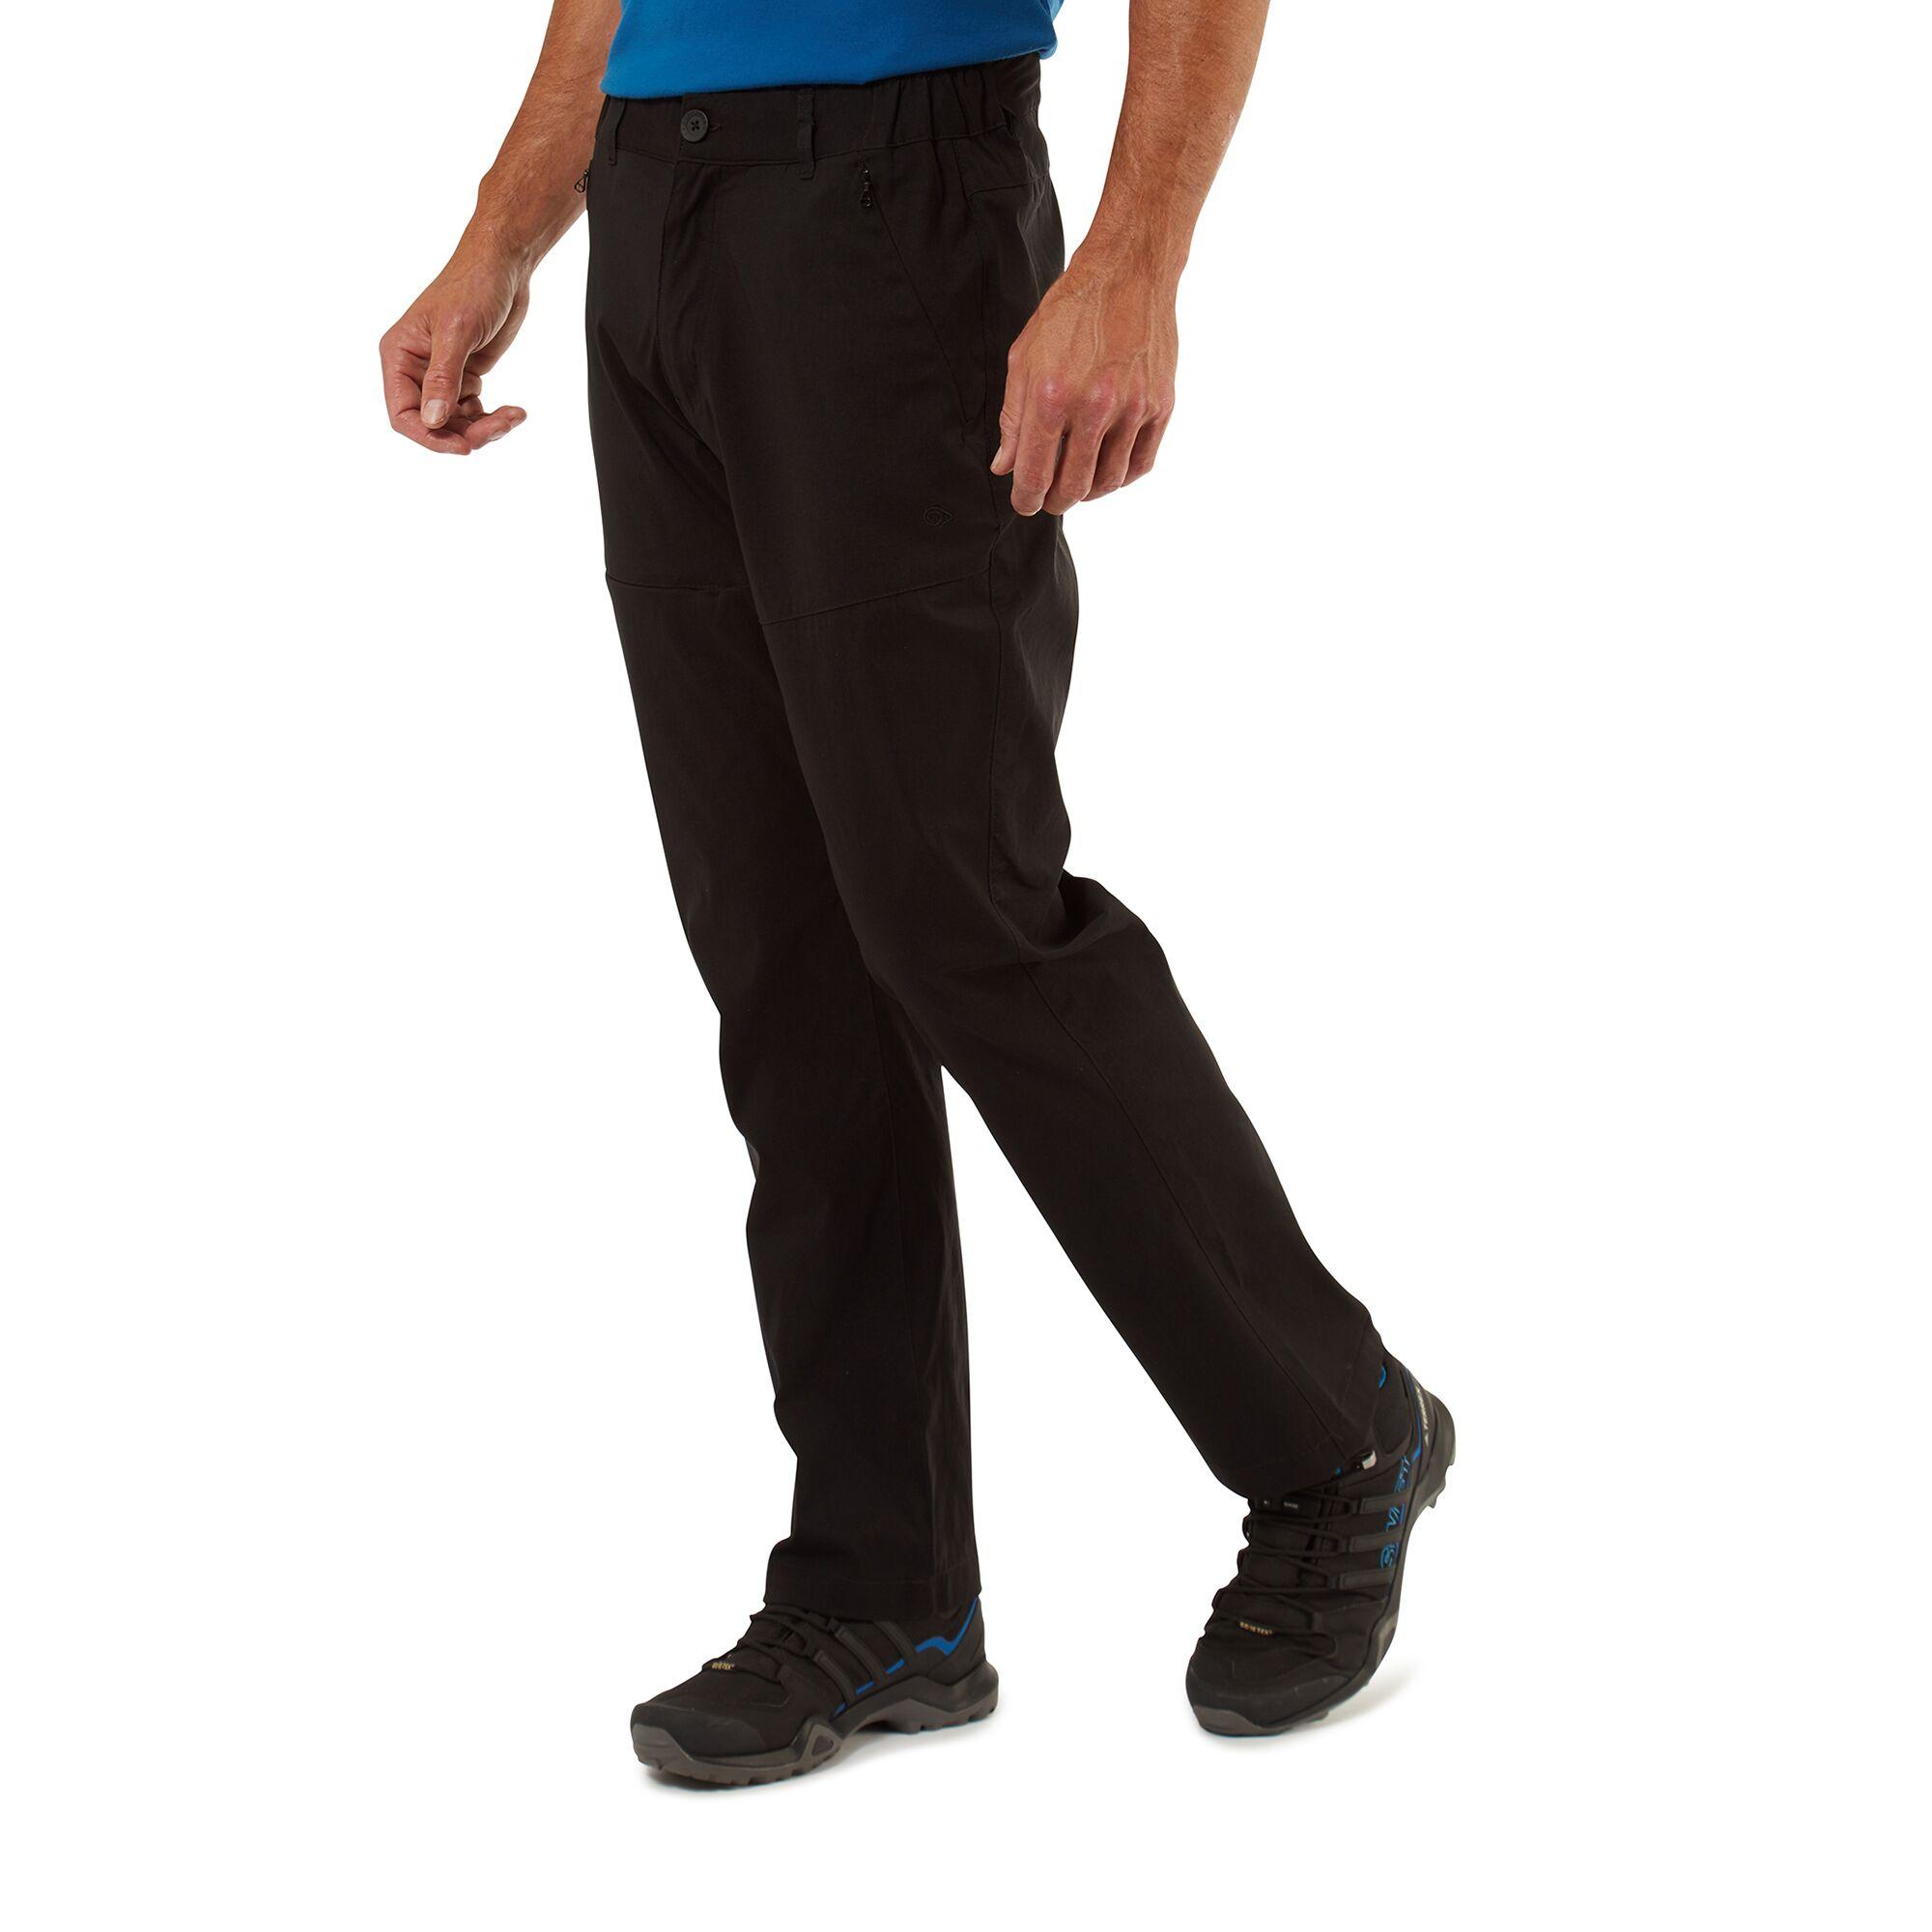 Craghoppers Mens Classic Kiwi Trousers - Bark - 38l